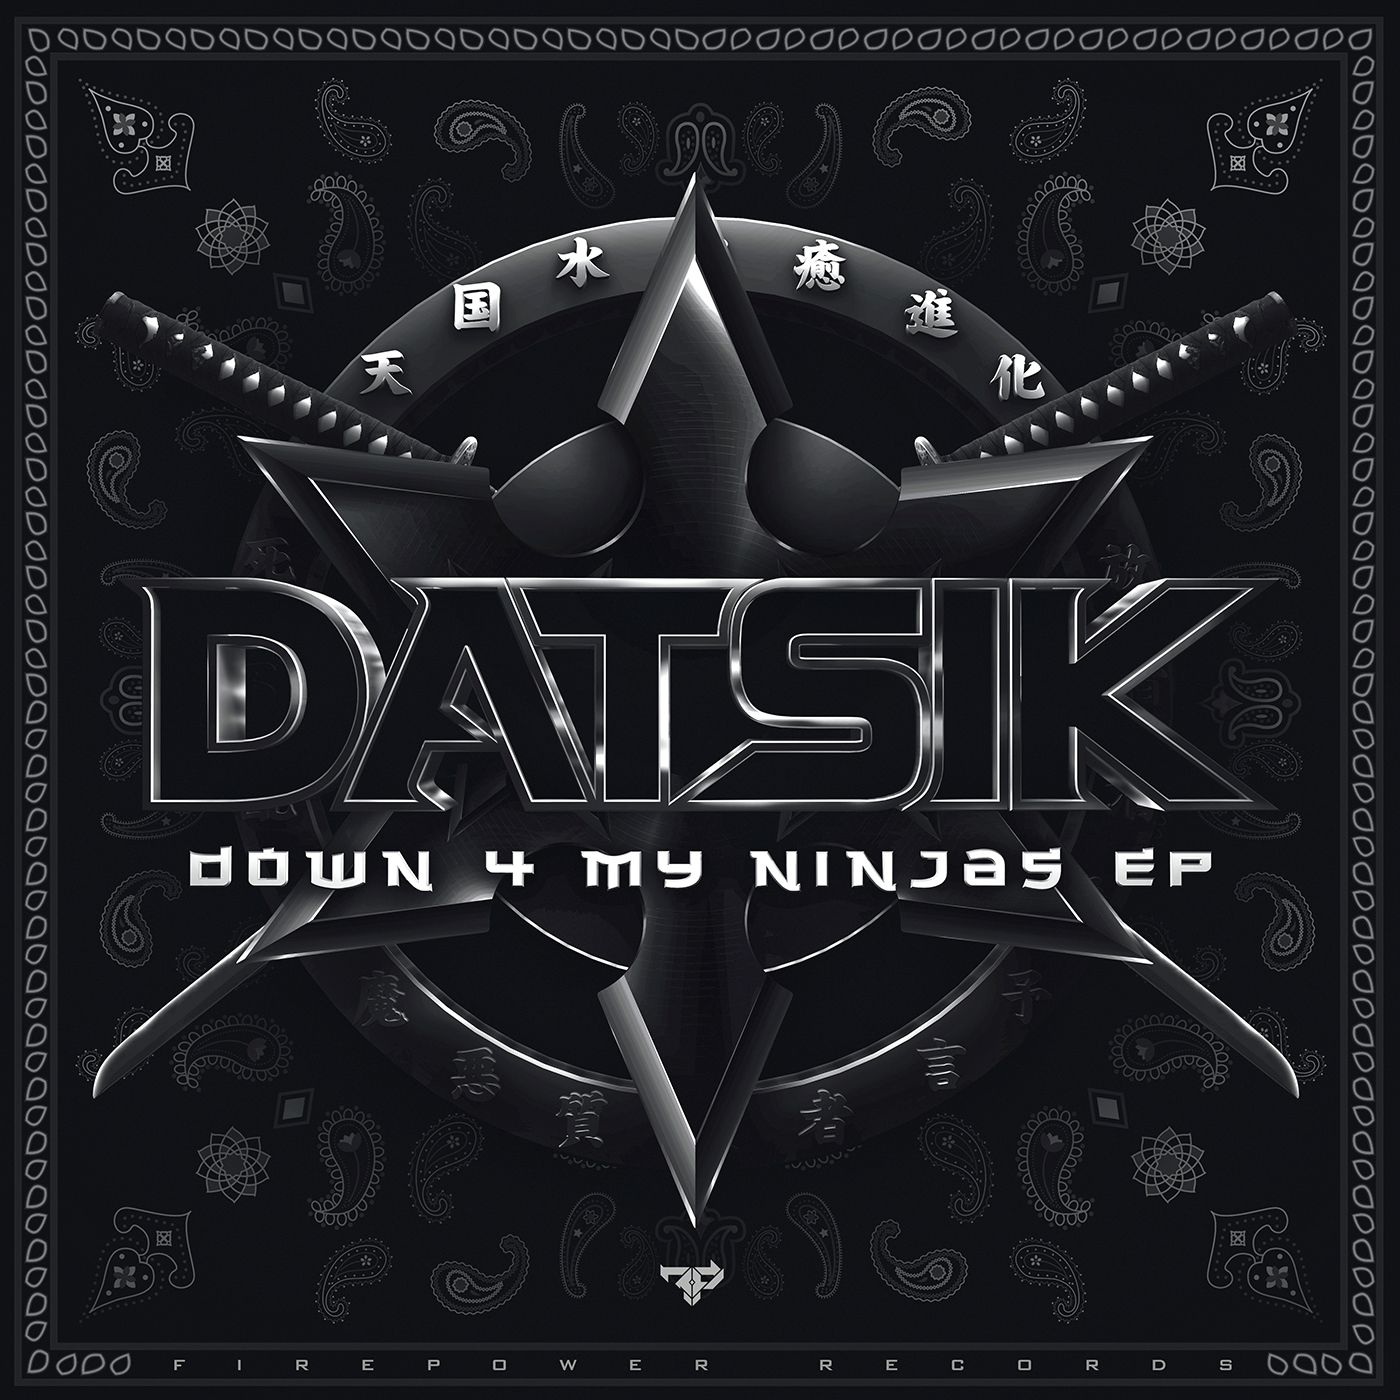 datsik_down_4_my_ninjas_ep_art_1400px